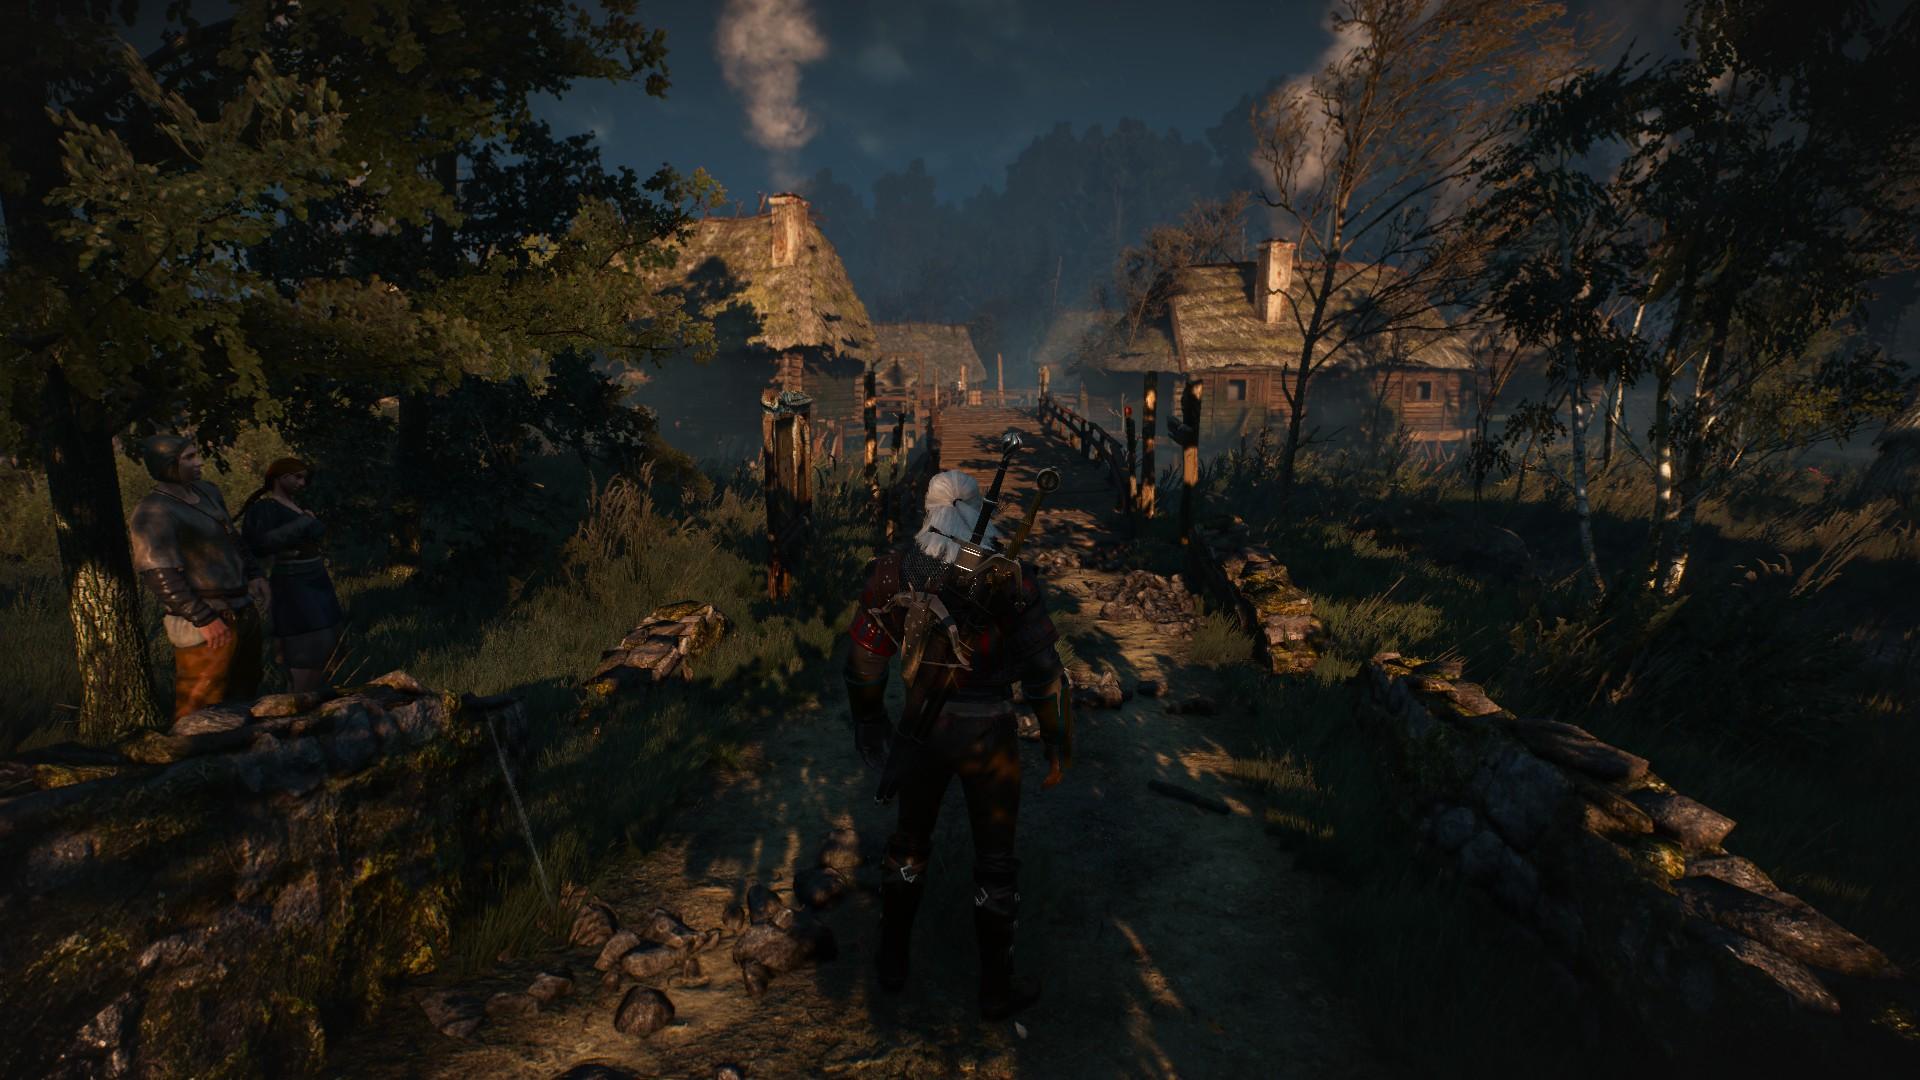 Witcher 3: Wild Hunt, the - The Witcher 3: Wild Hunt